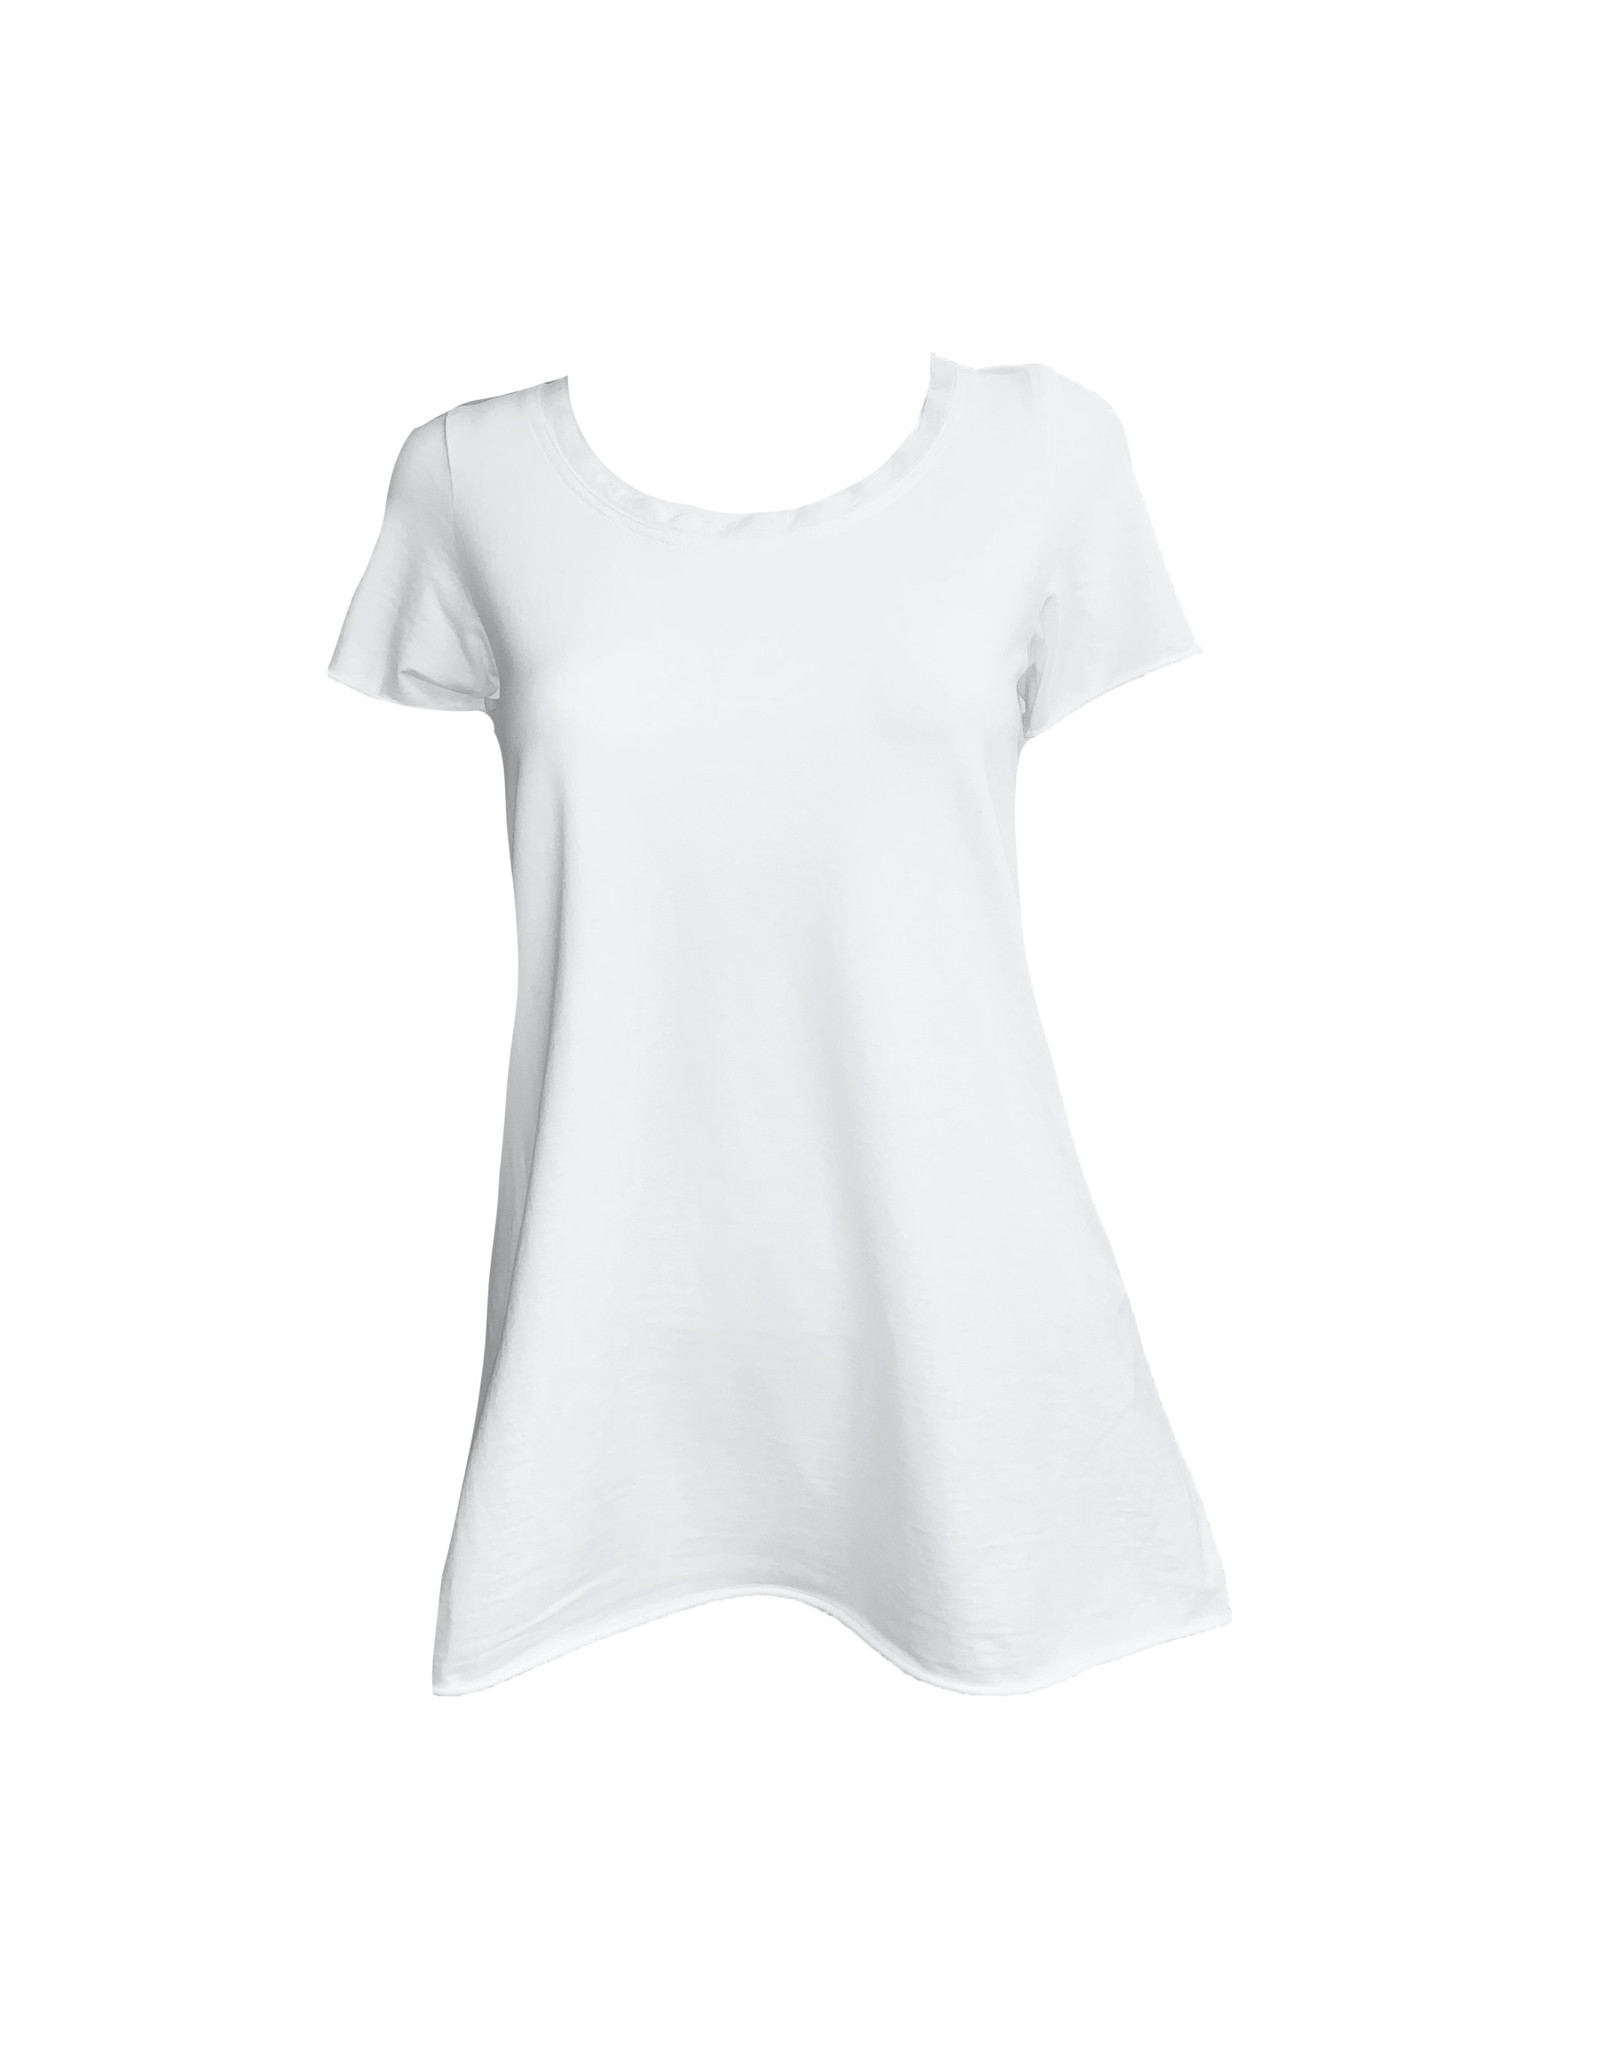 Studio Rundholz Studio Rundholz Short Sleeve Tee-White